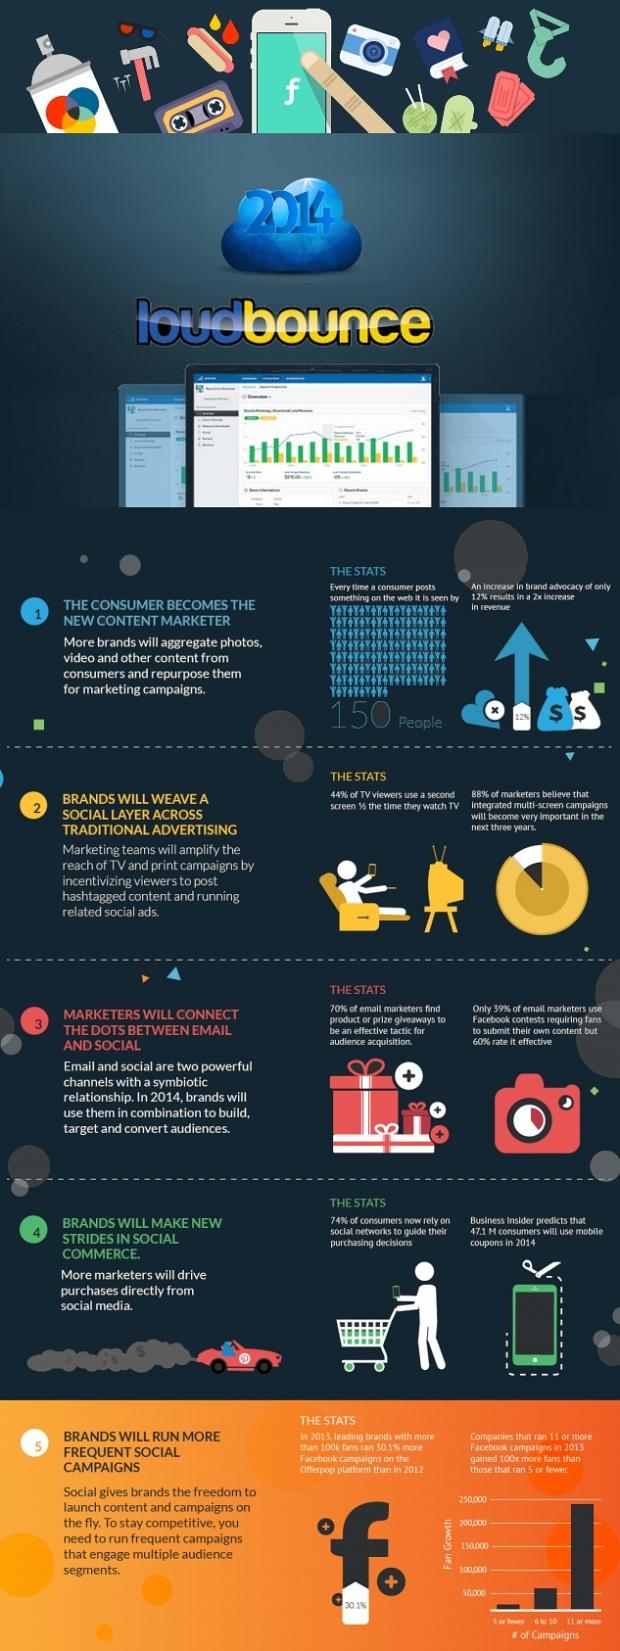 Social Media Ecommerce Trends in 2014